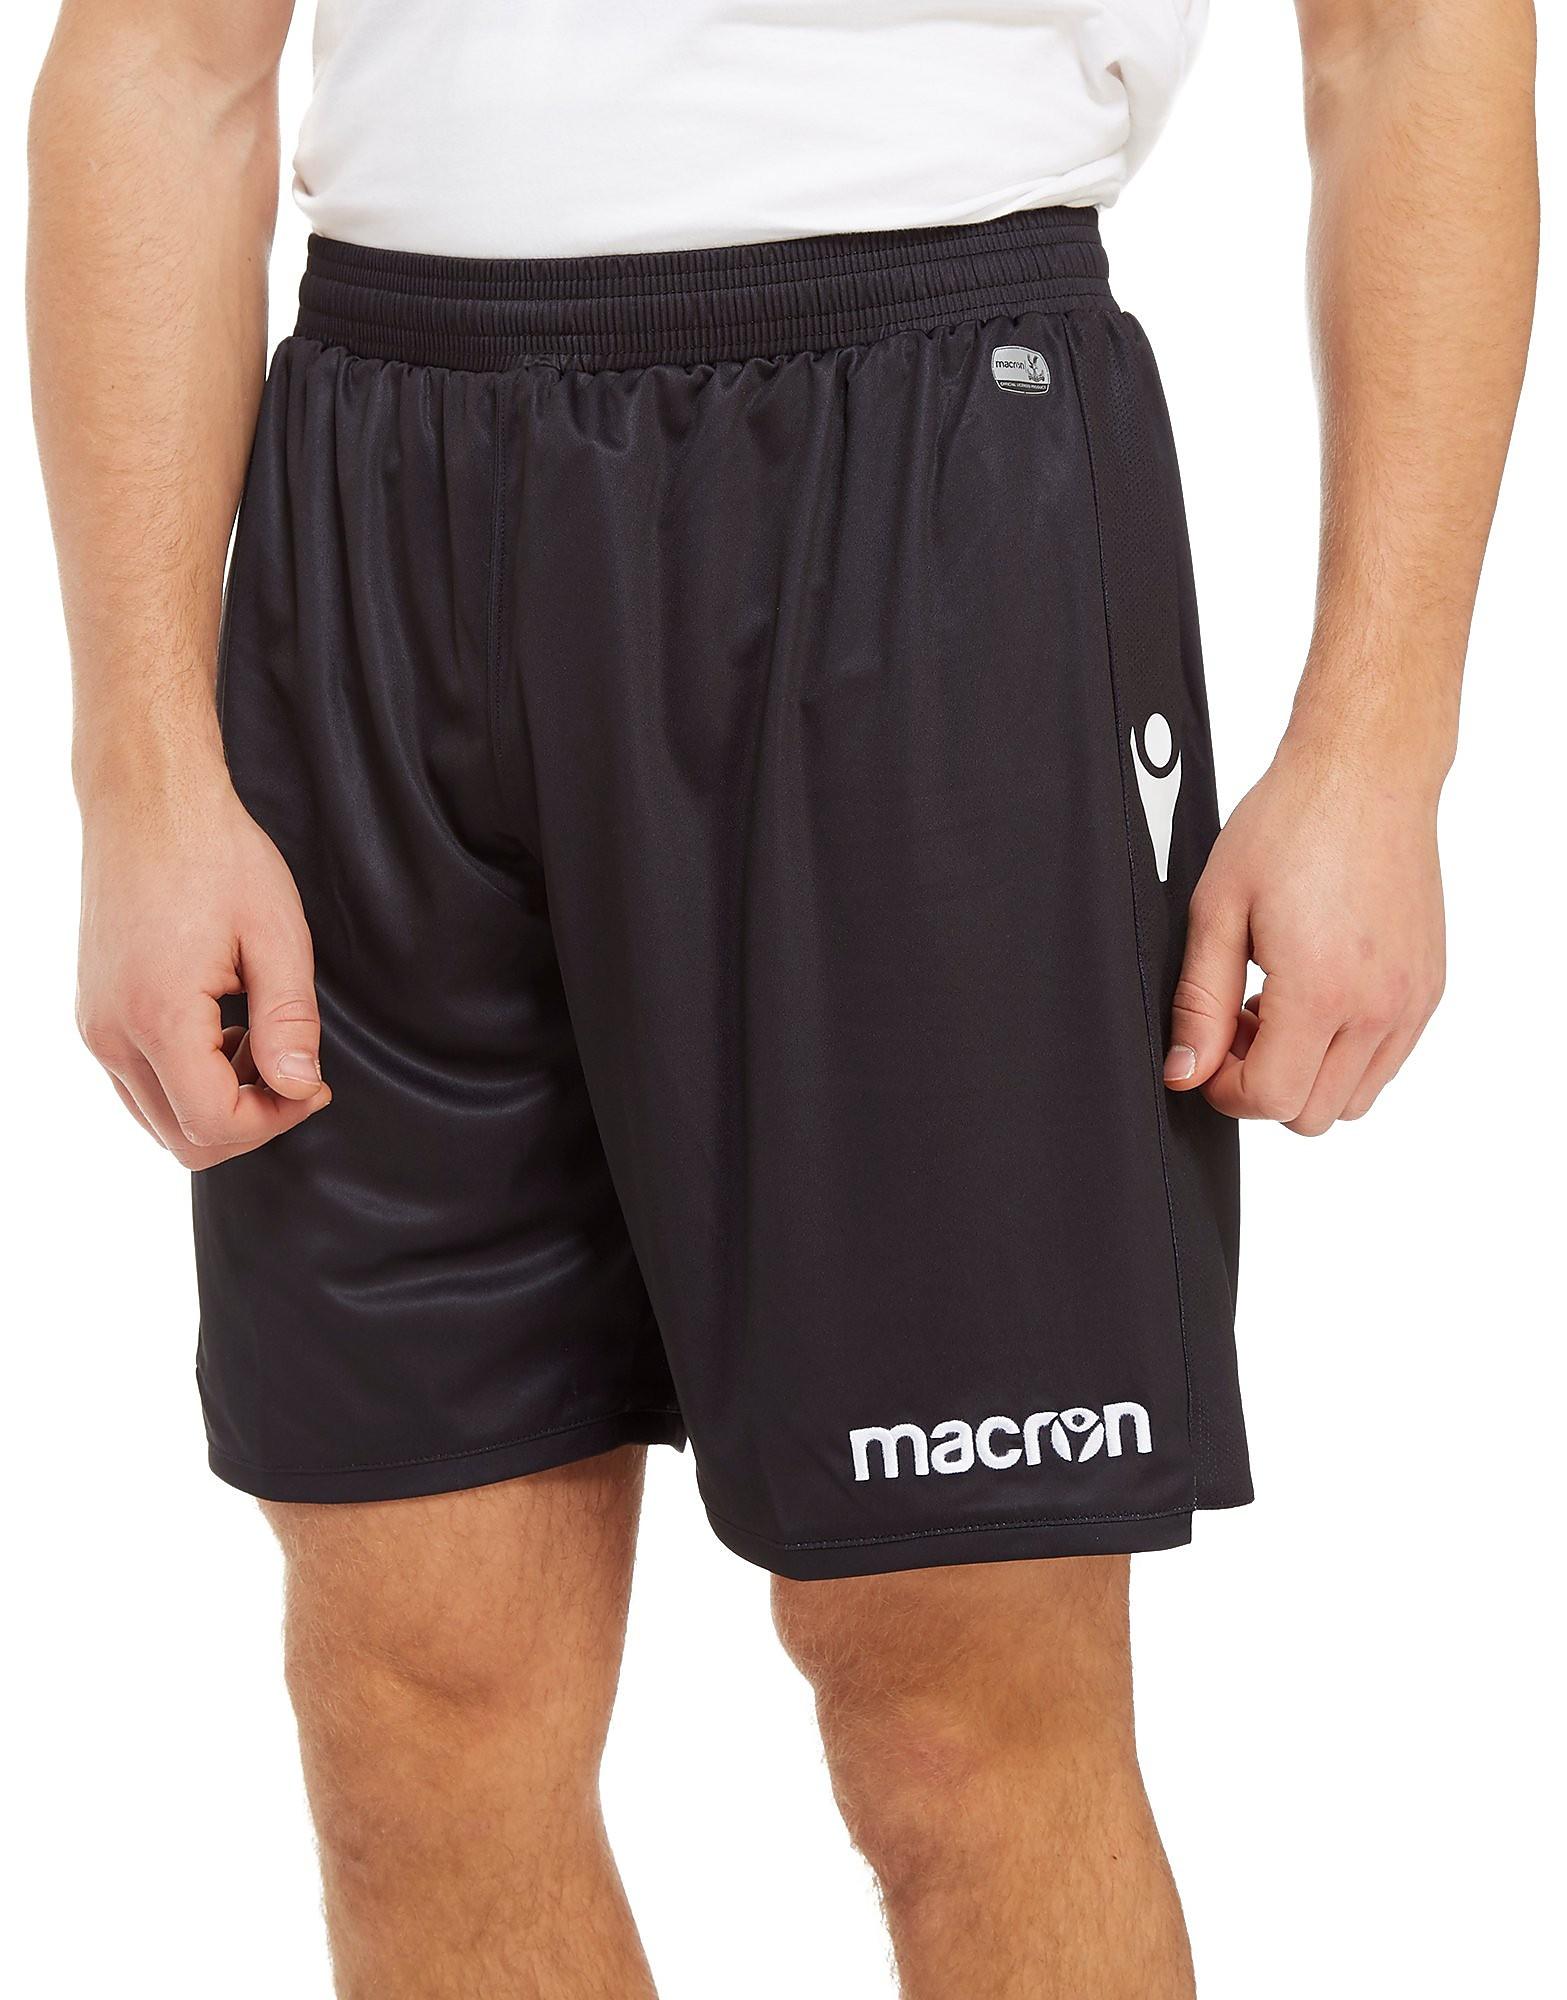 Macron Cystal Palace FC 2017/18 Away Shorts